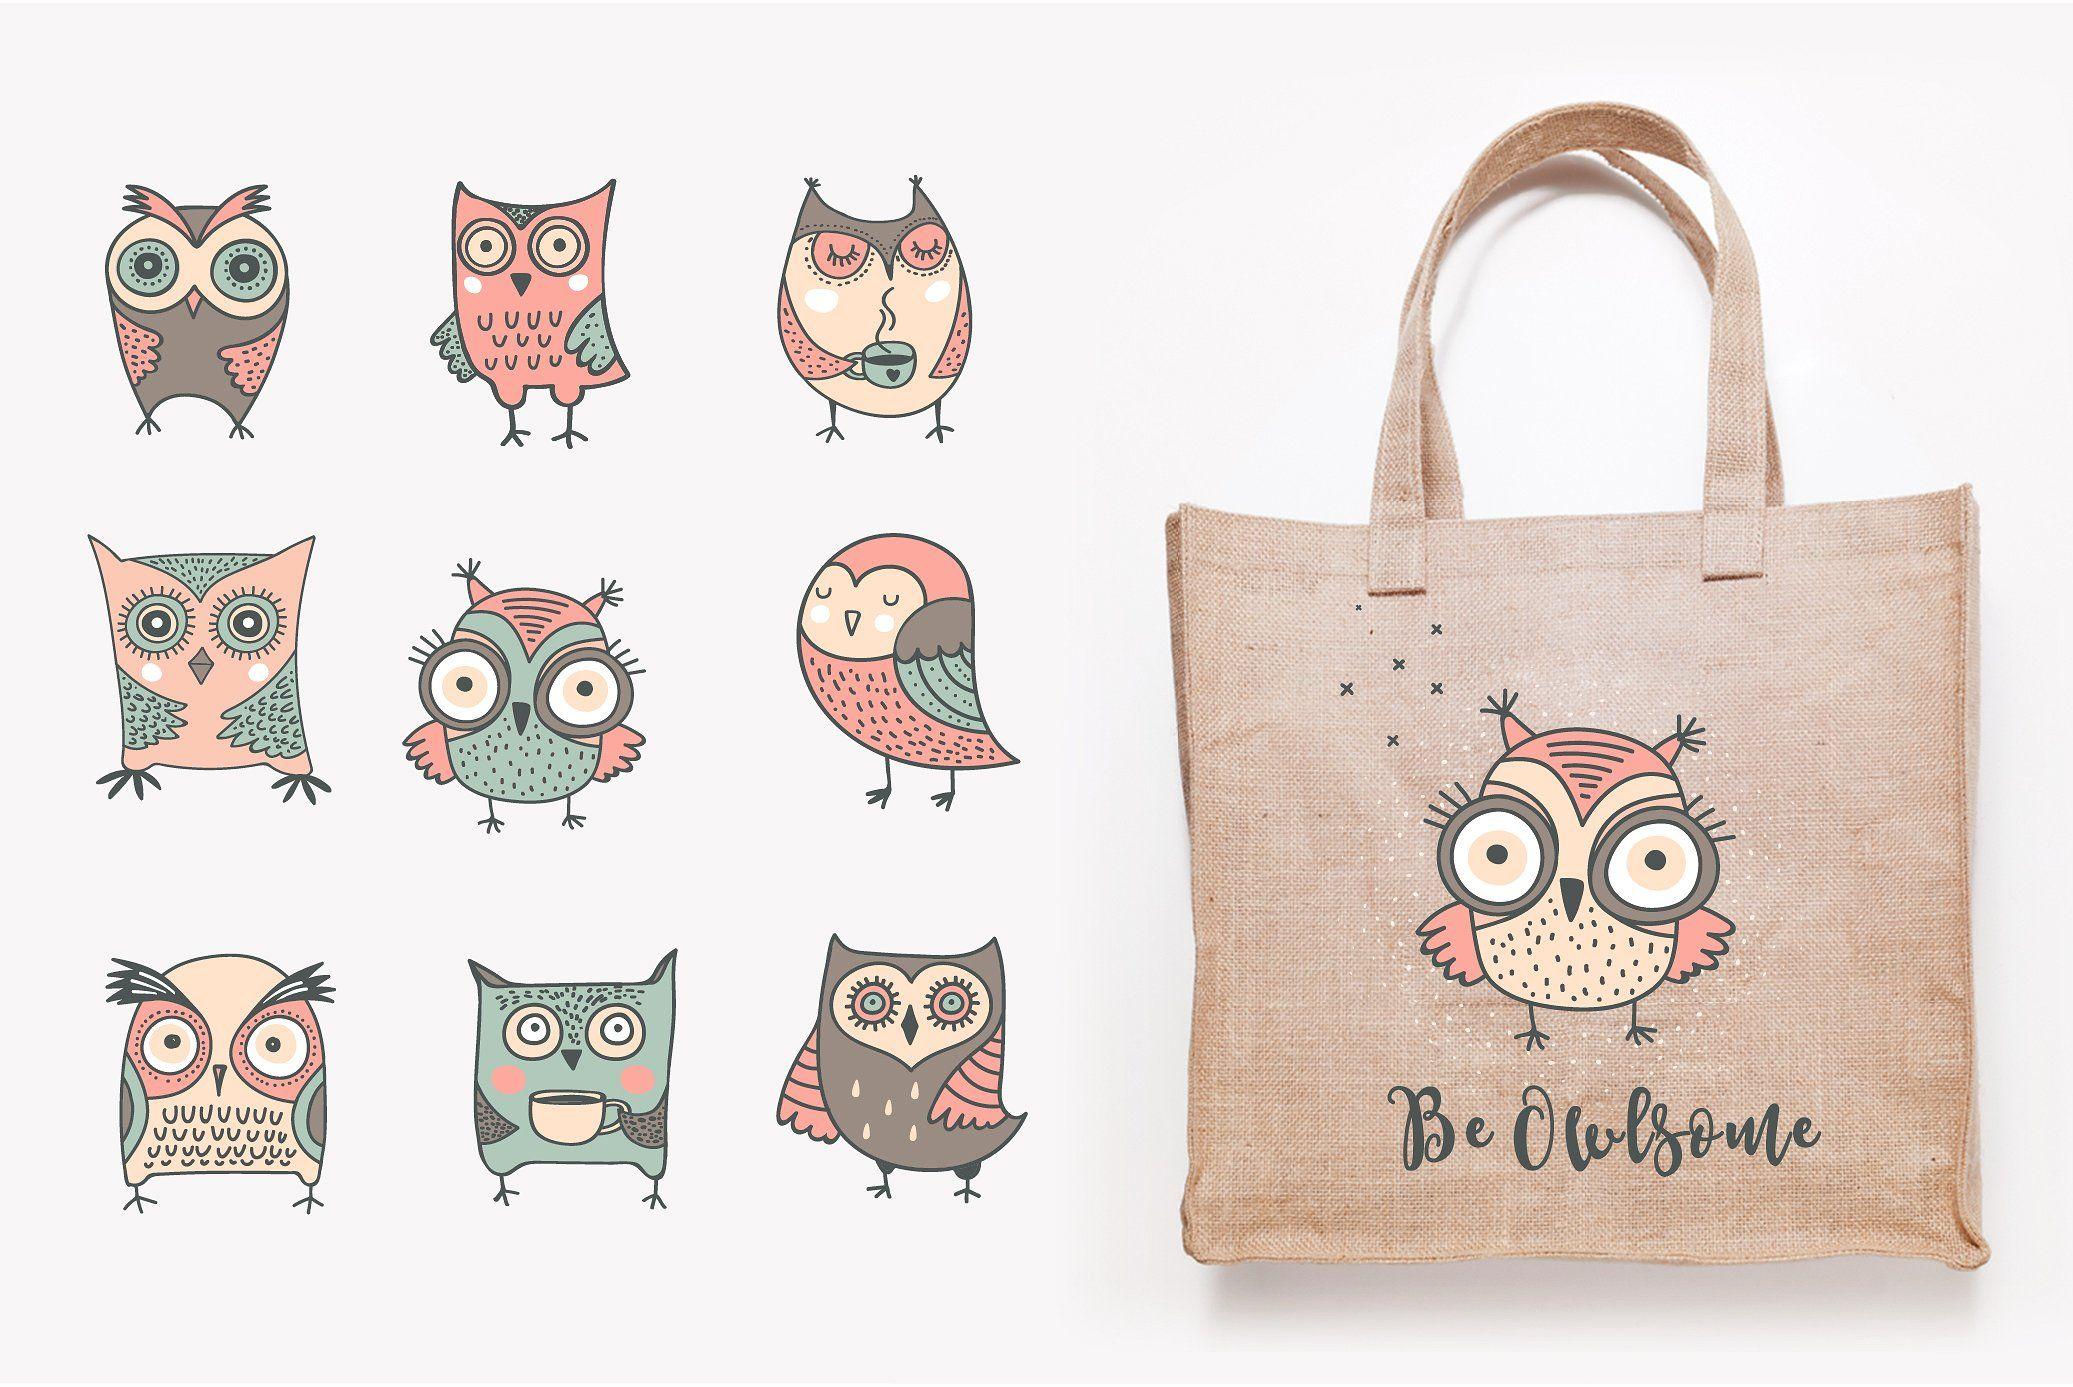 Cute Hand Drawn Owl Illustrations